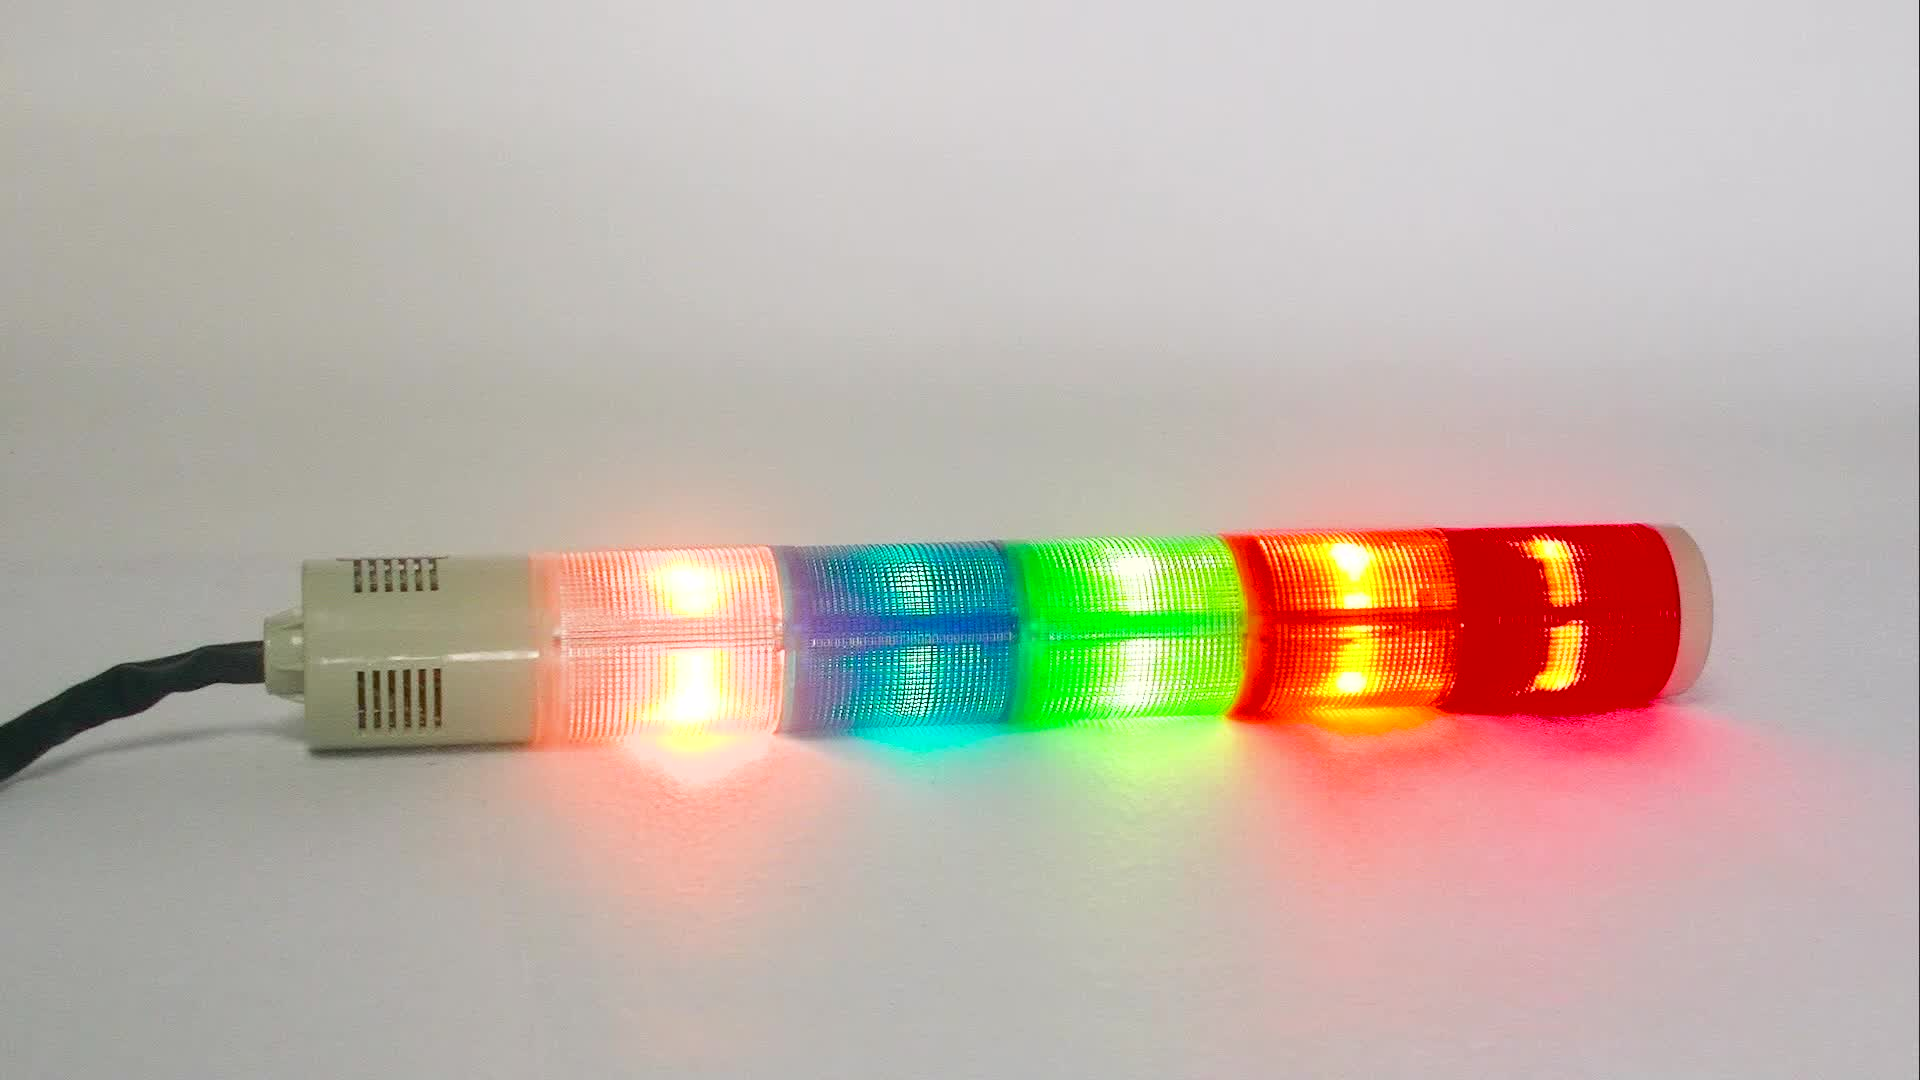 LTA-052J Flashing machine light indicator warning light LED signal tower light with sound